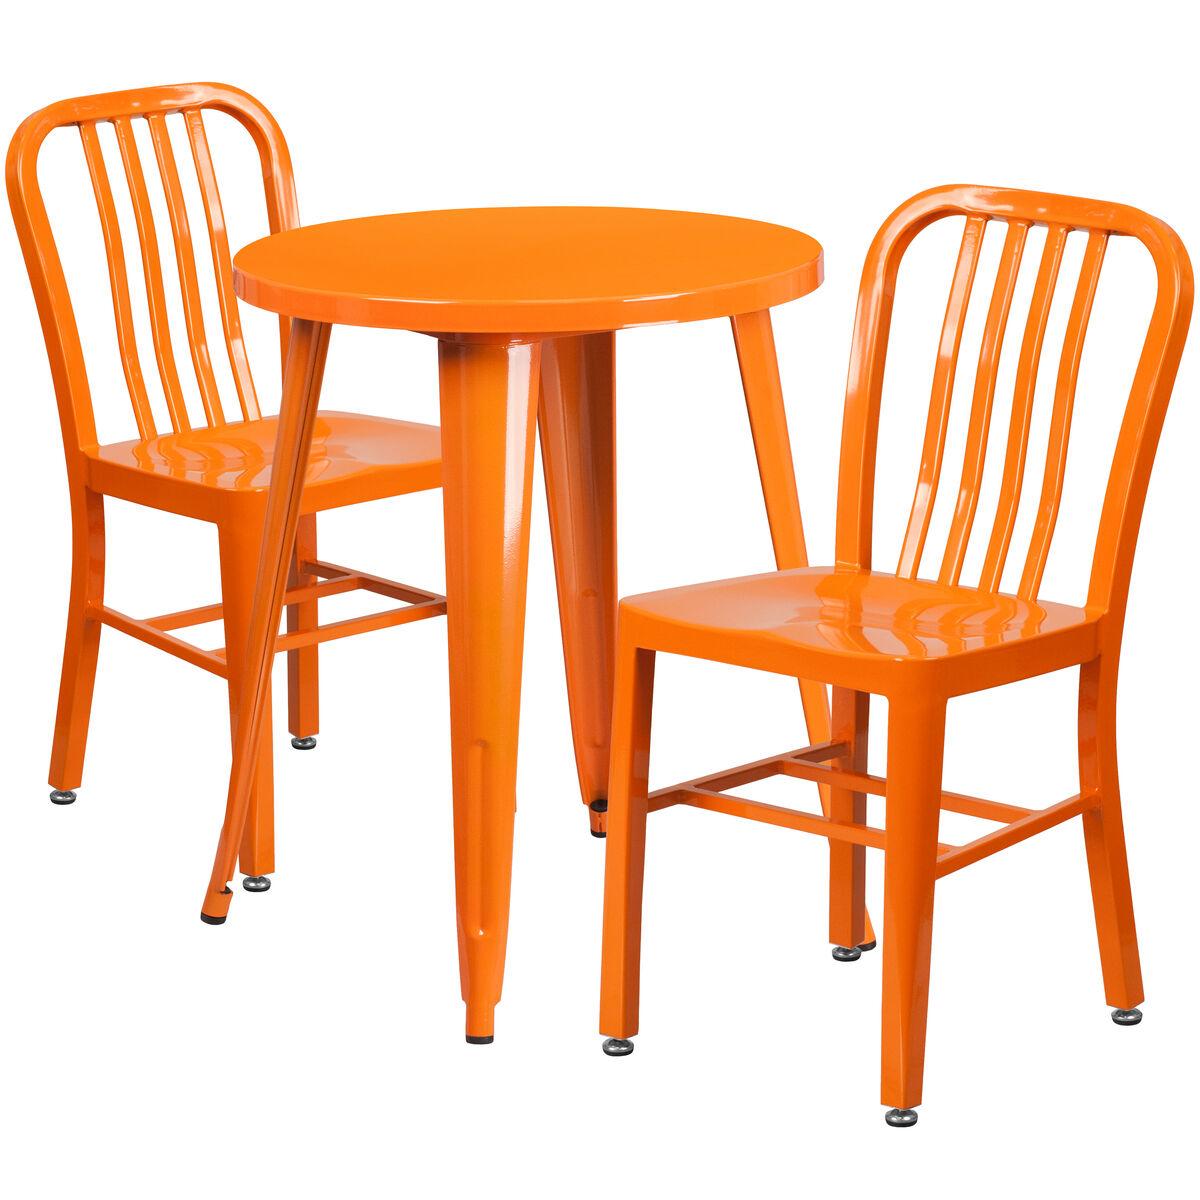 24rd orange metal table set ch 51080th 2 18vrt or gg bizchair com